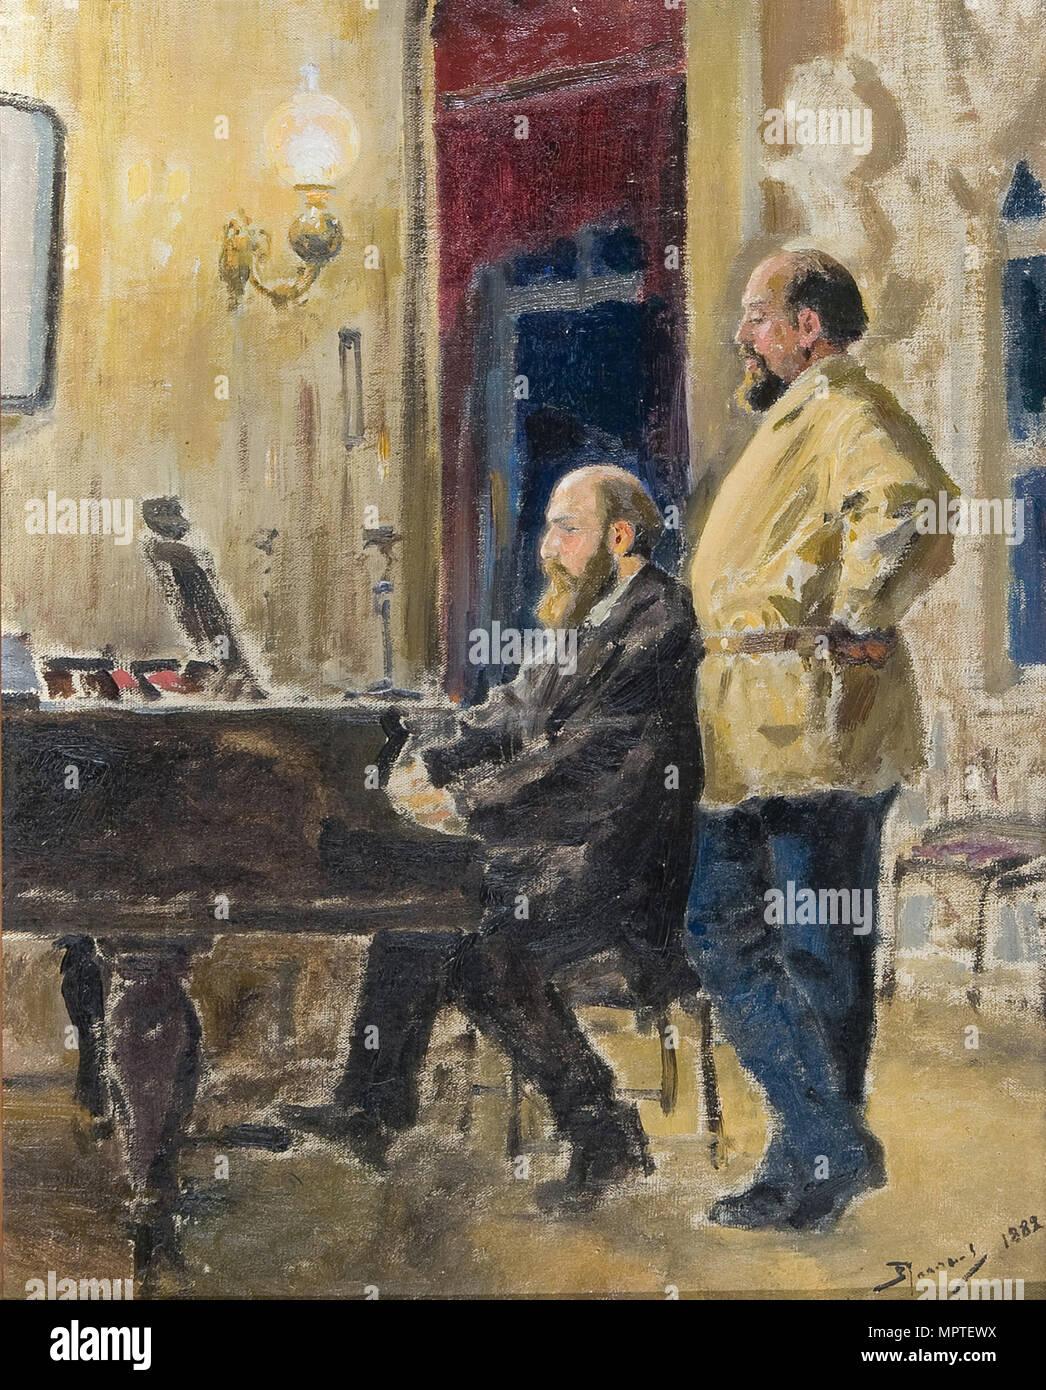 Pyotr Antonovich Spiro at piano and Savva Mamontov, 1882. - Stock Image